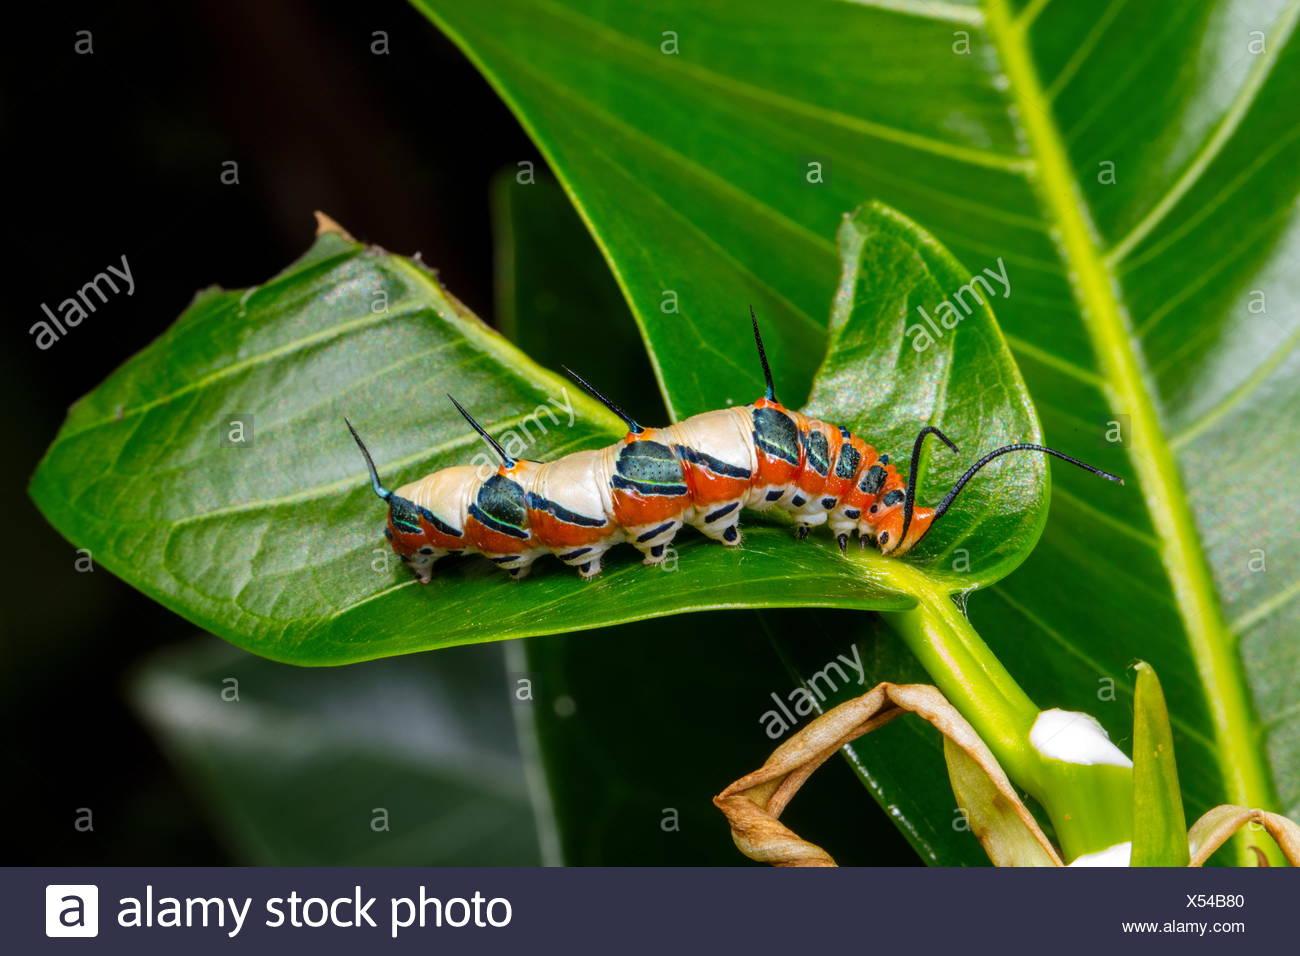 A ruddy daggerwing, Marpesia petreus, caterpillar feeding on its stangler fig host plant. - Stock Image